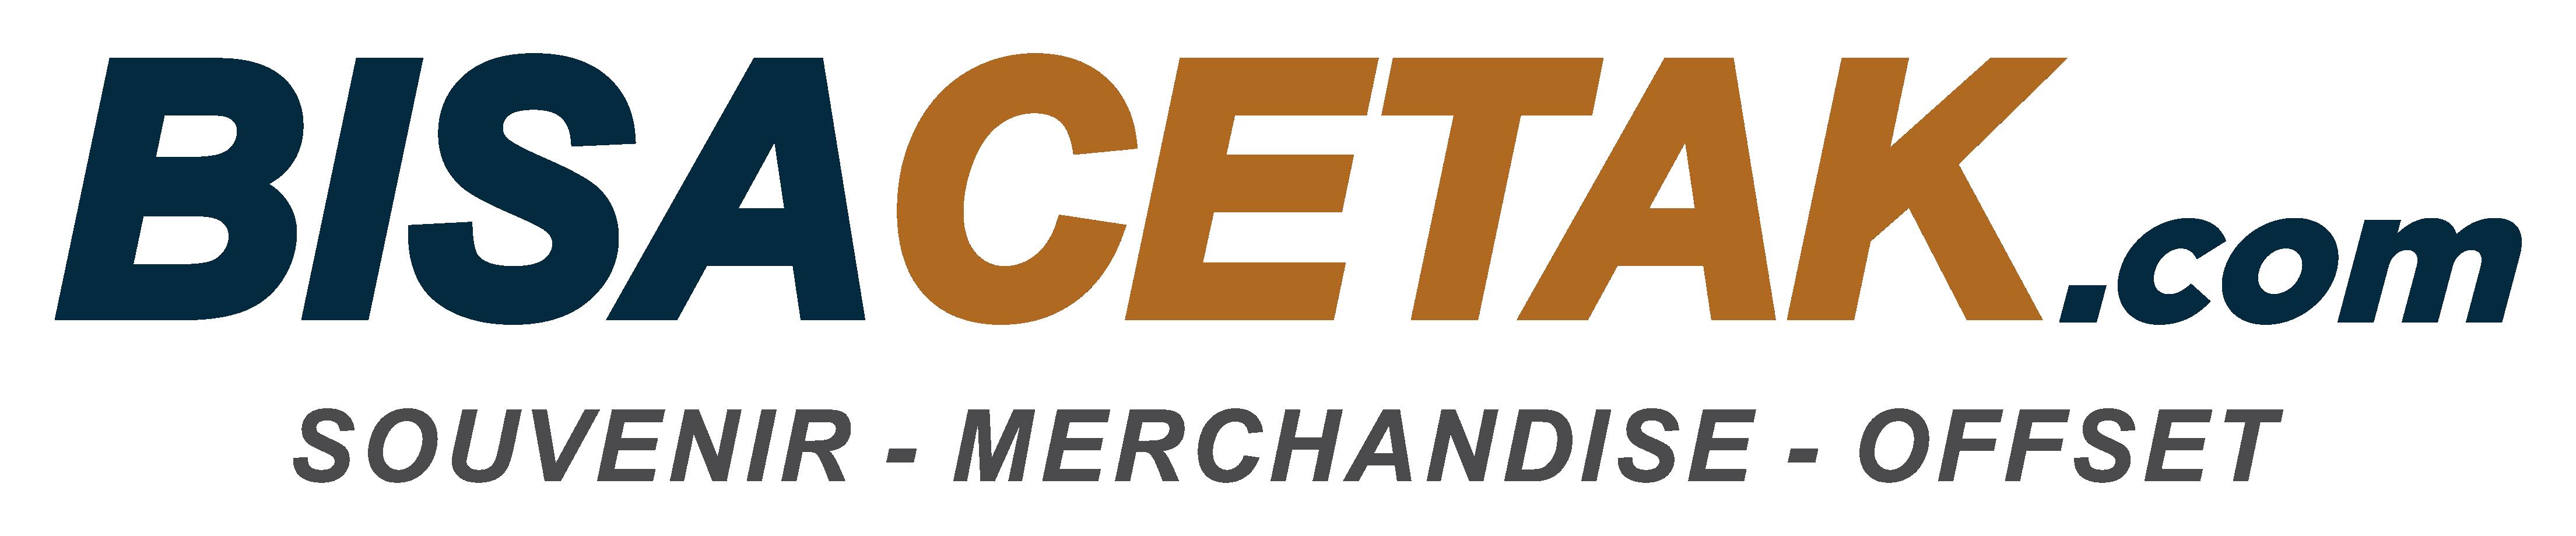 BisaCetak.com